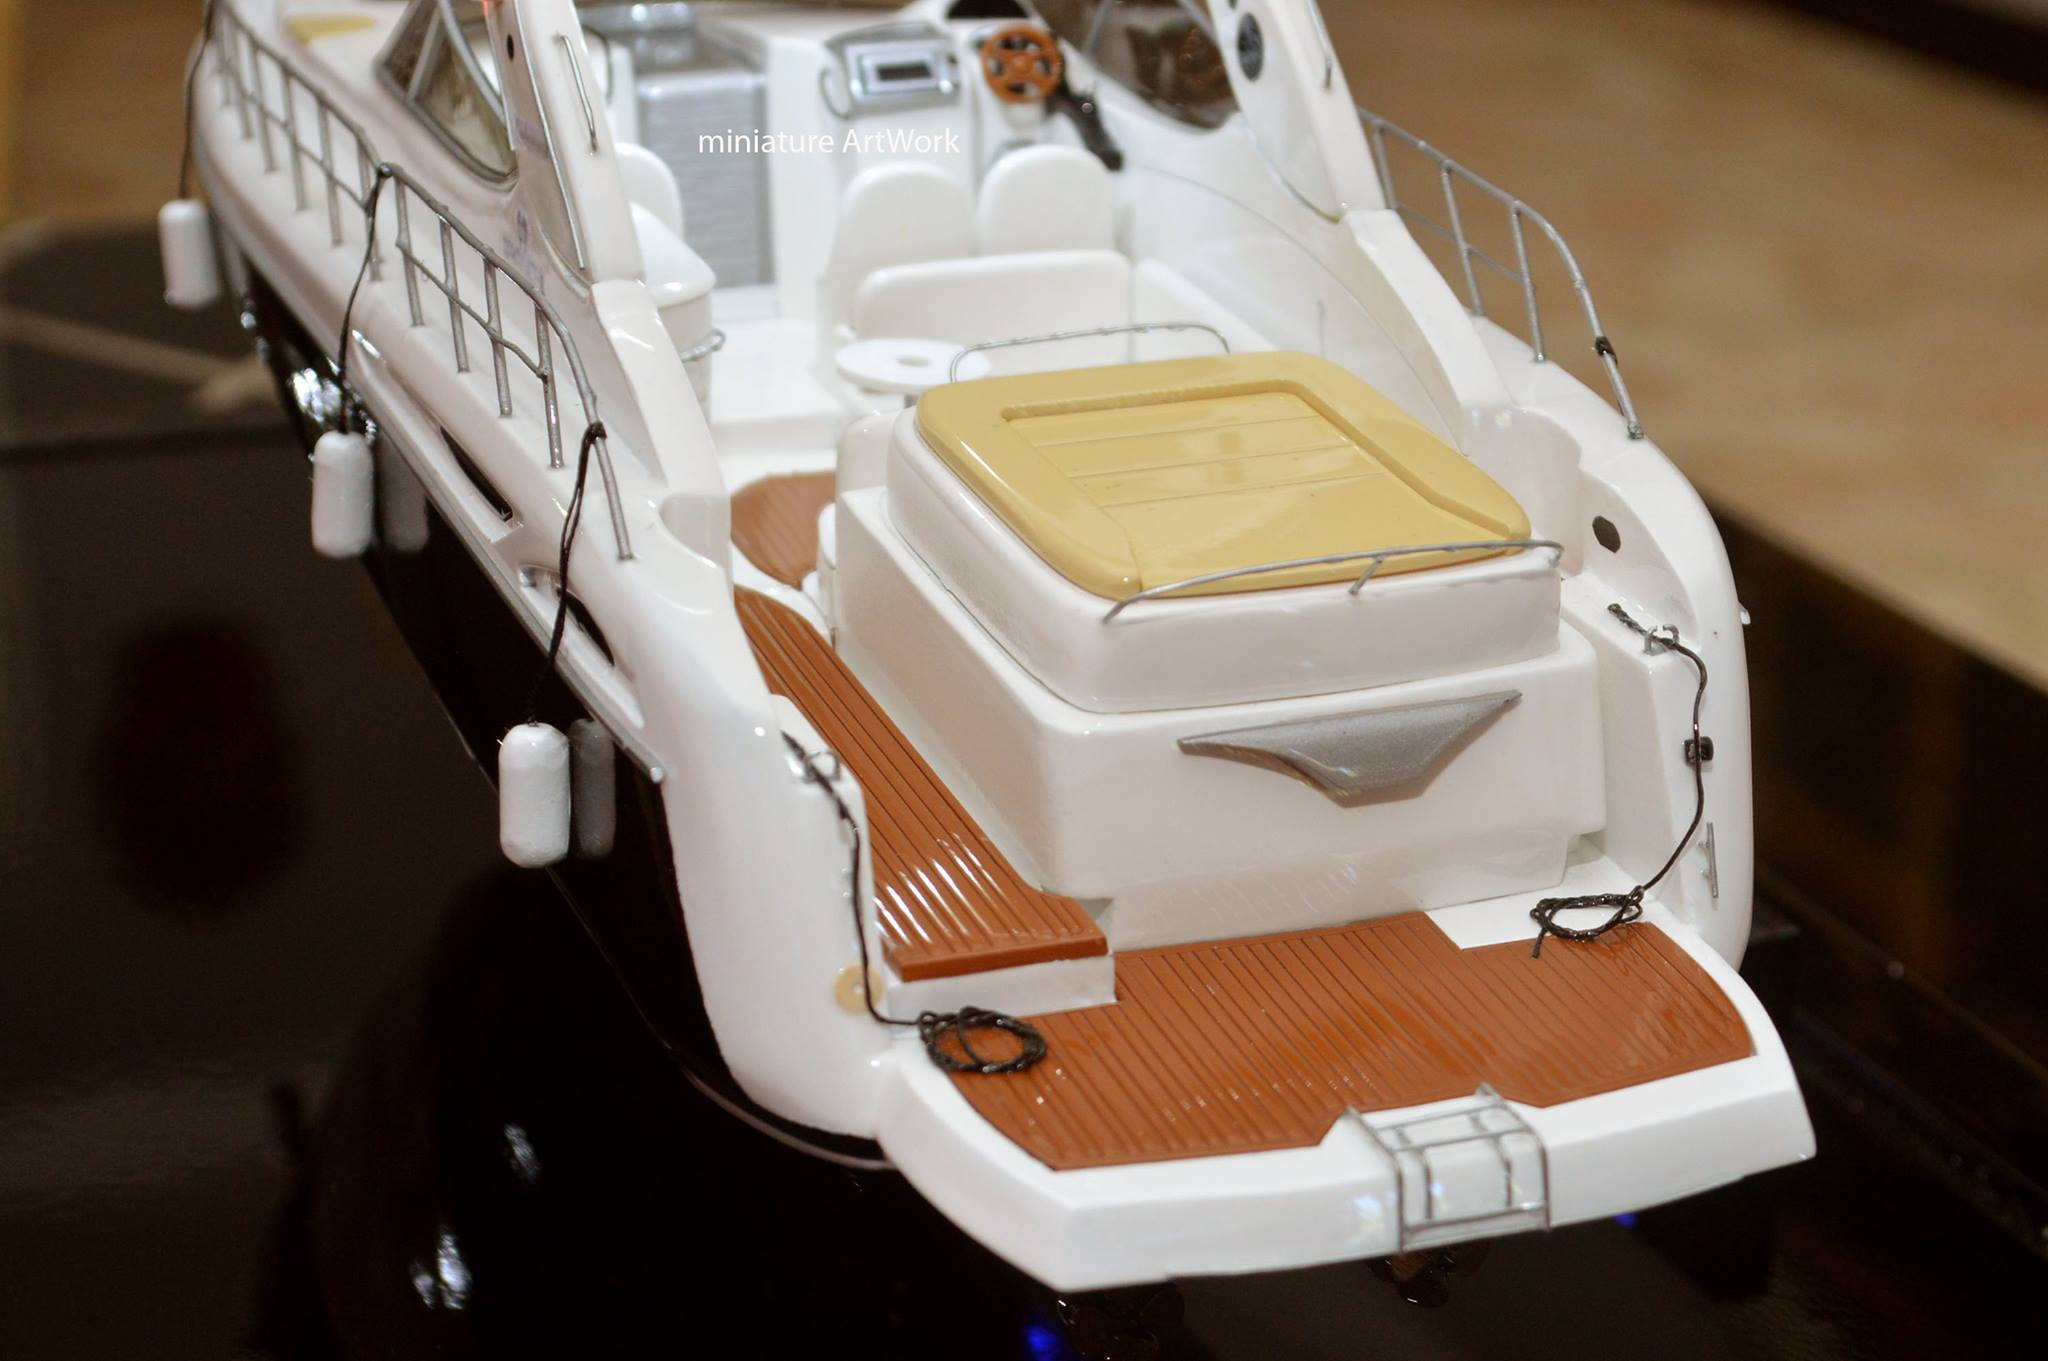 tempat jual maket miniatur kapal yacht cranchi 41 endurance harga murah planet kapal rumpun artwork